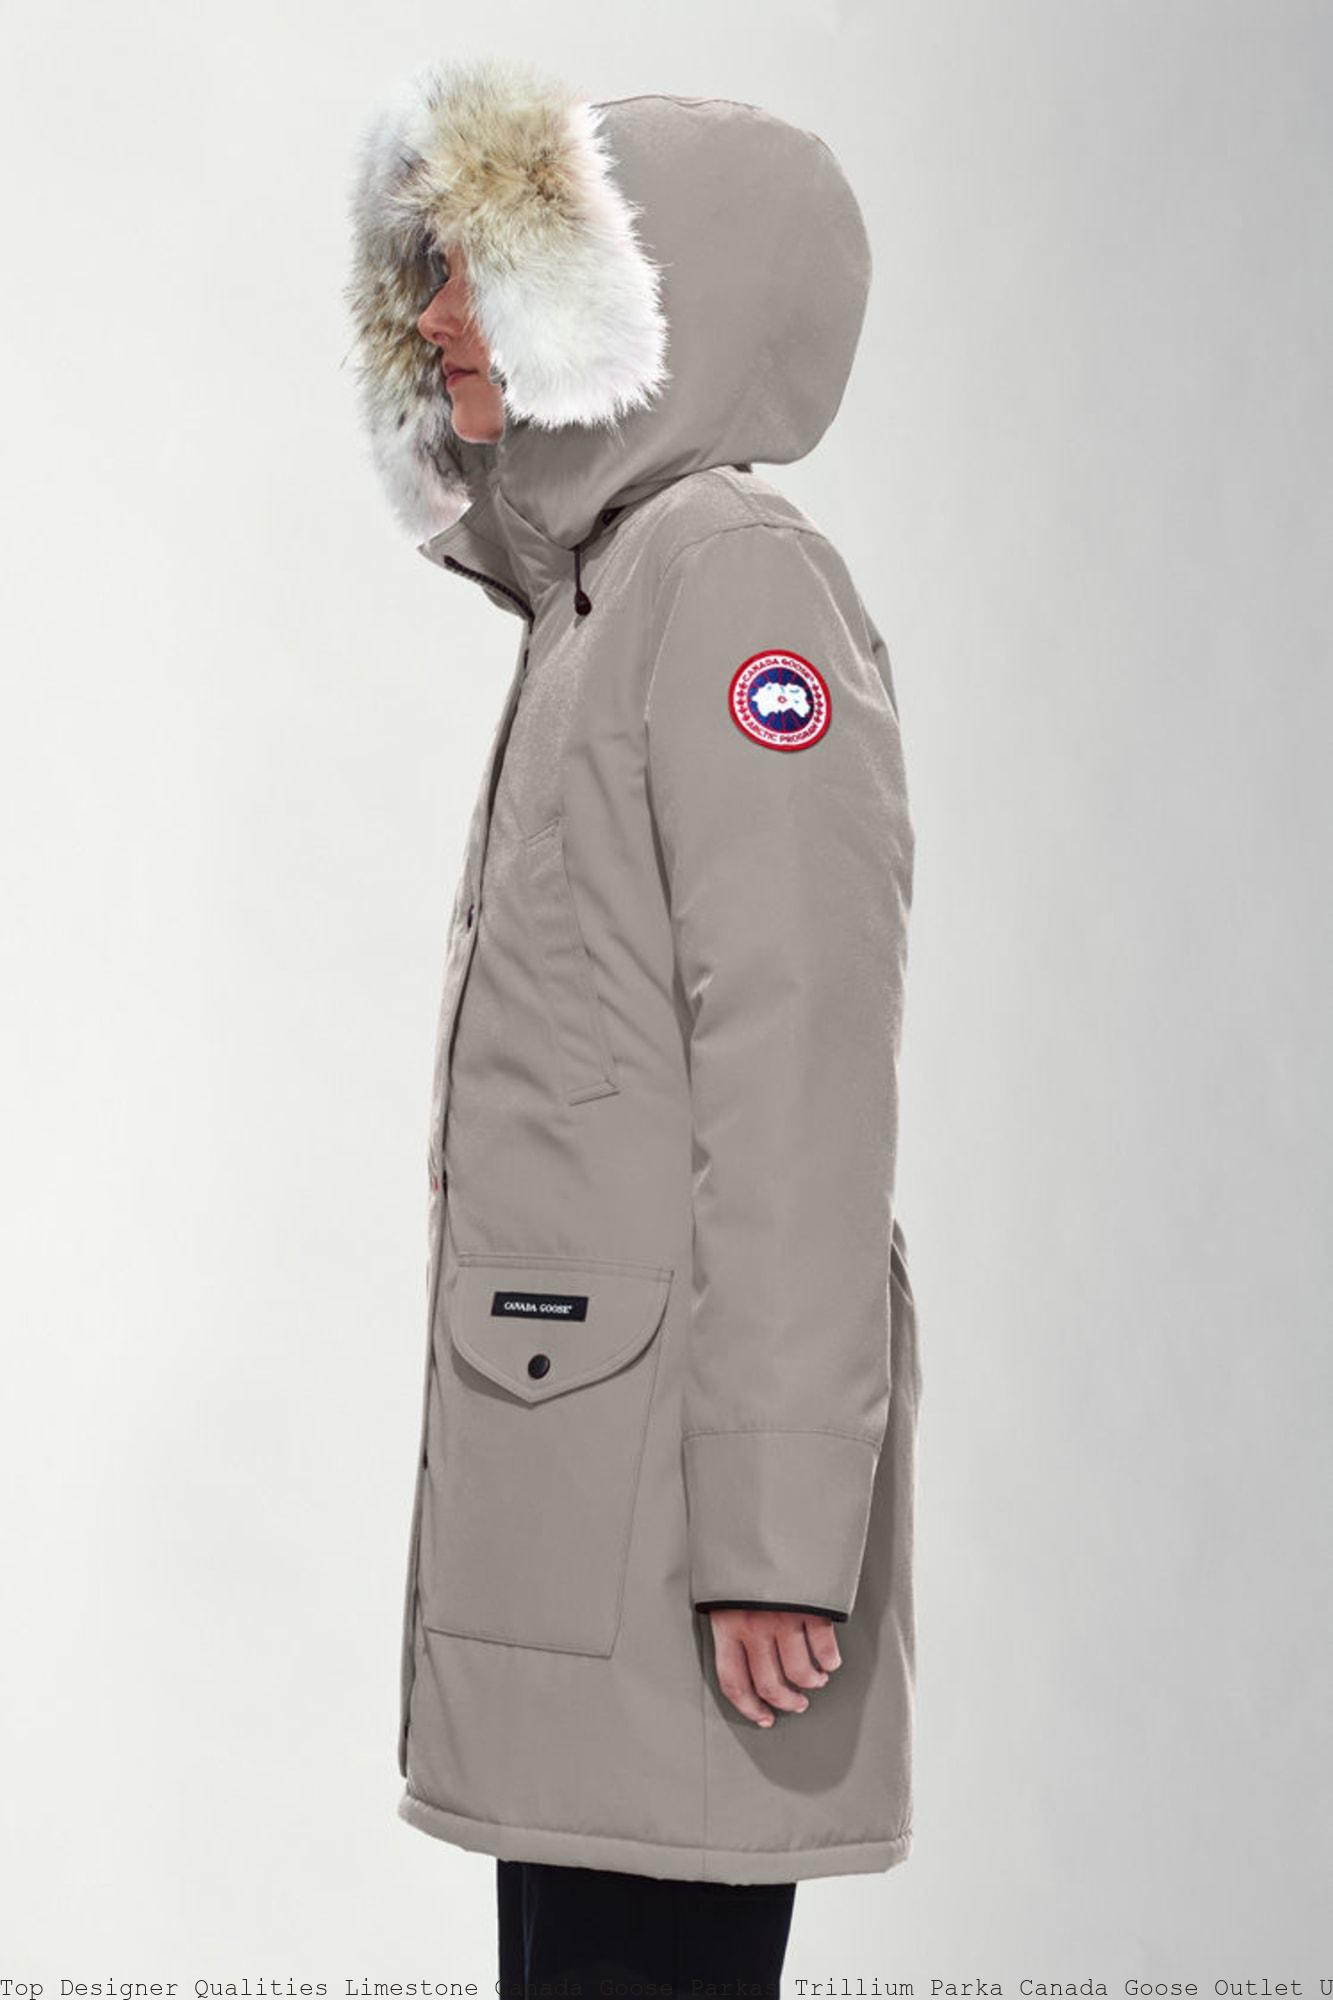 Top Designer Qualities Limestone Canada Goose Parkas Trillium Parka Canada Goose Outlet Uk Sale 6660L